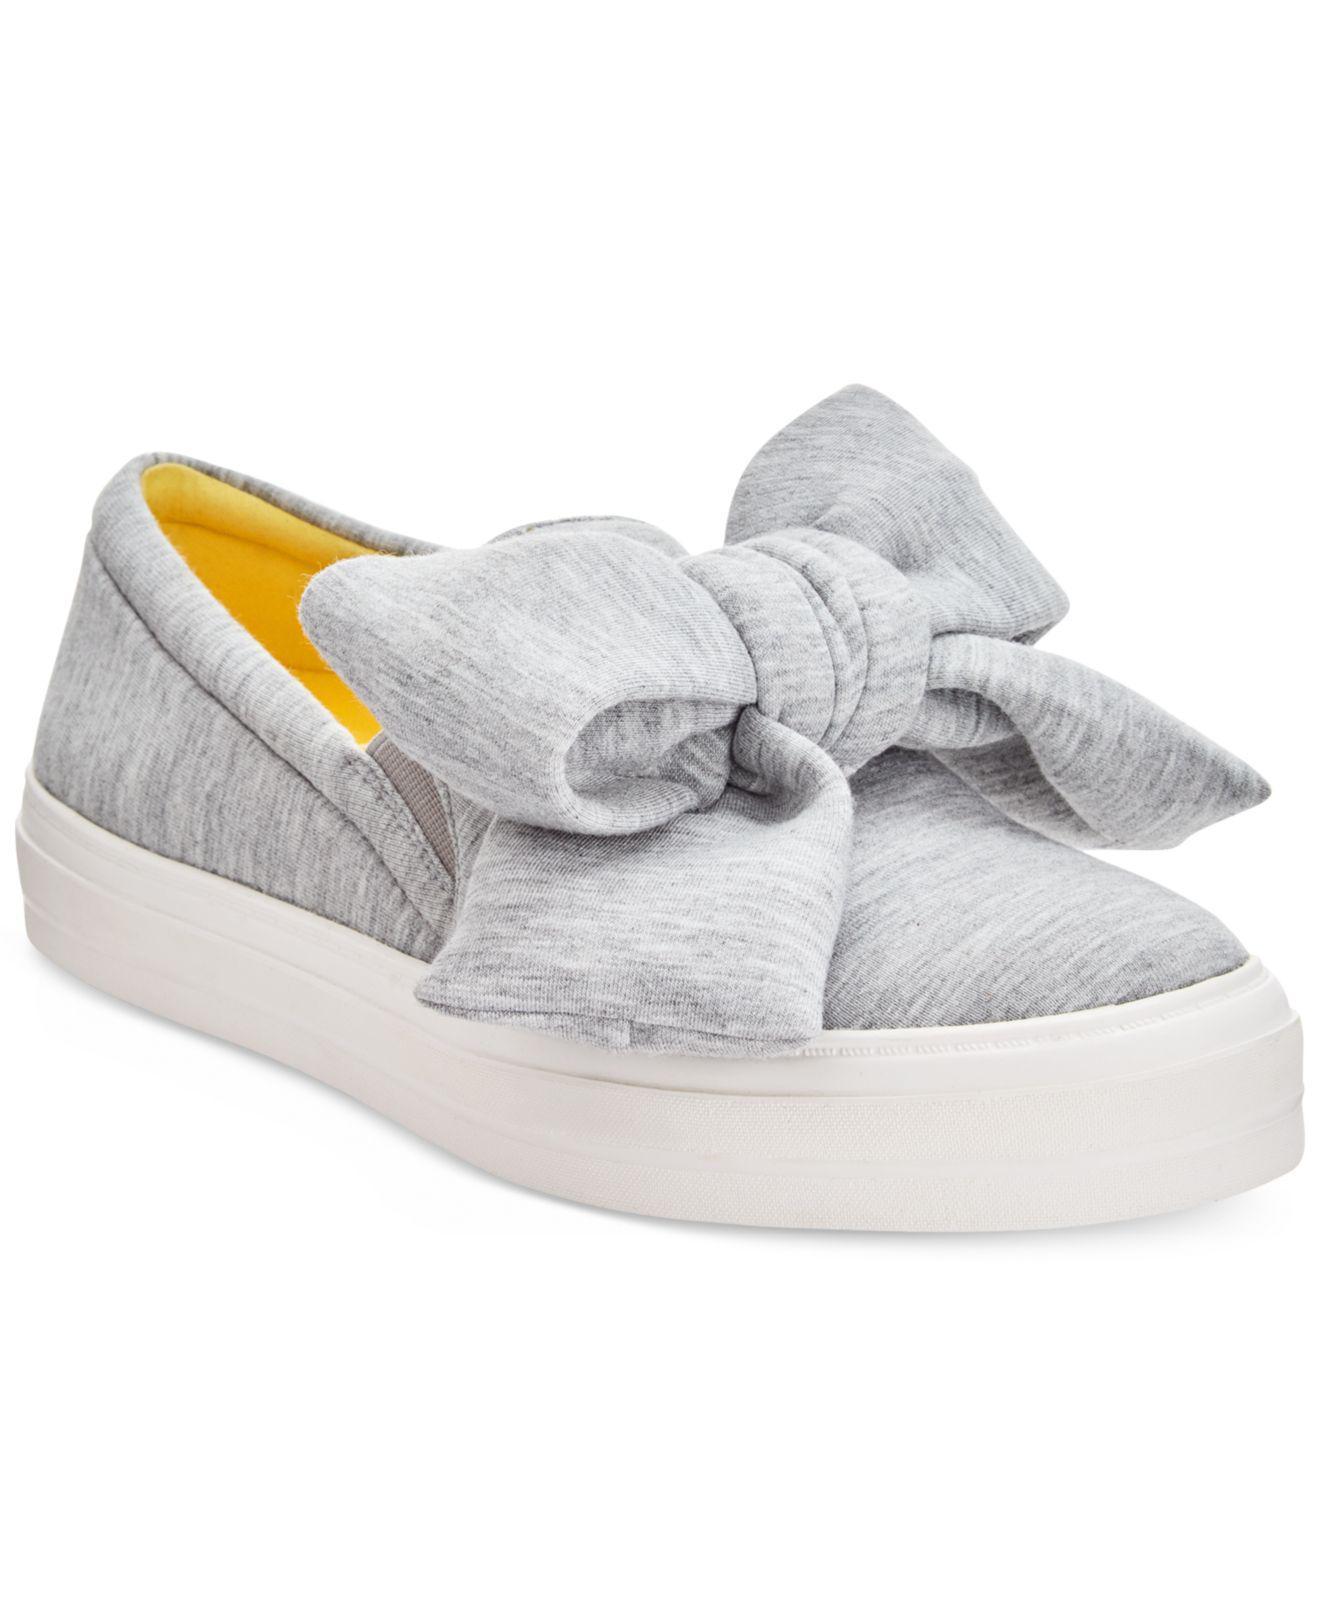 Onosha Bow Flatform Sneakers in Gray